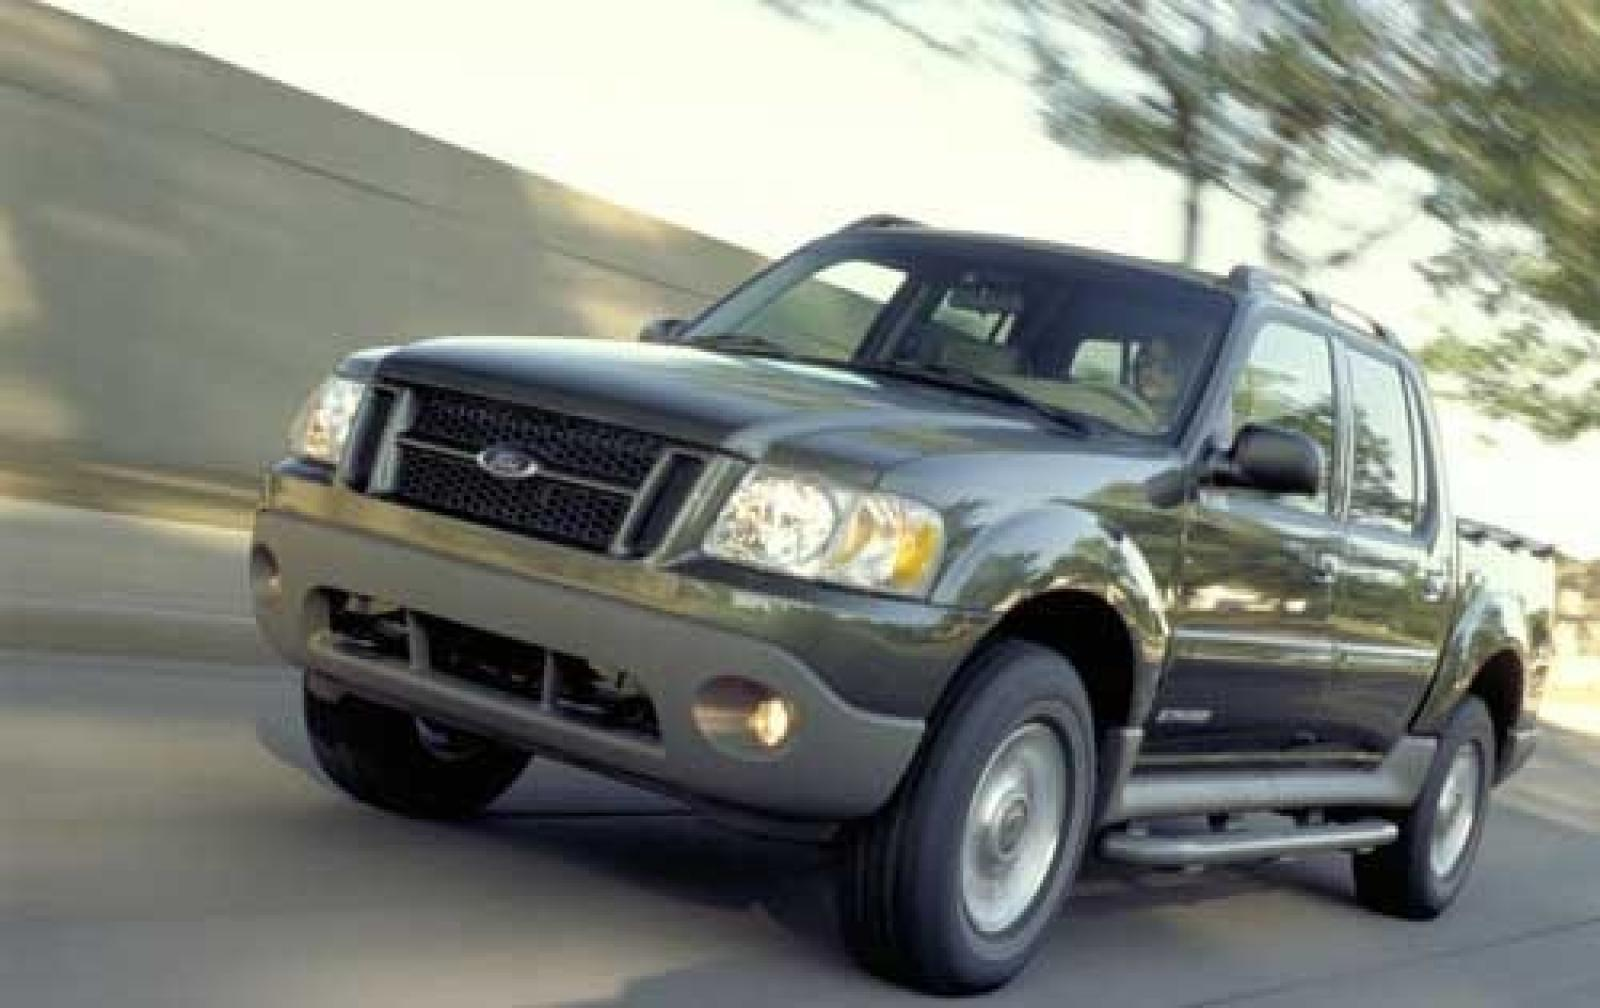 800 1024 1280 1600 origin 2004 ford explorer